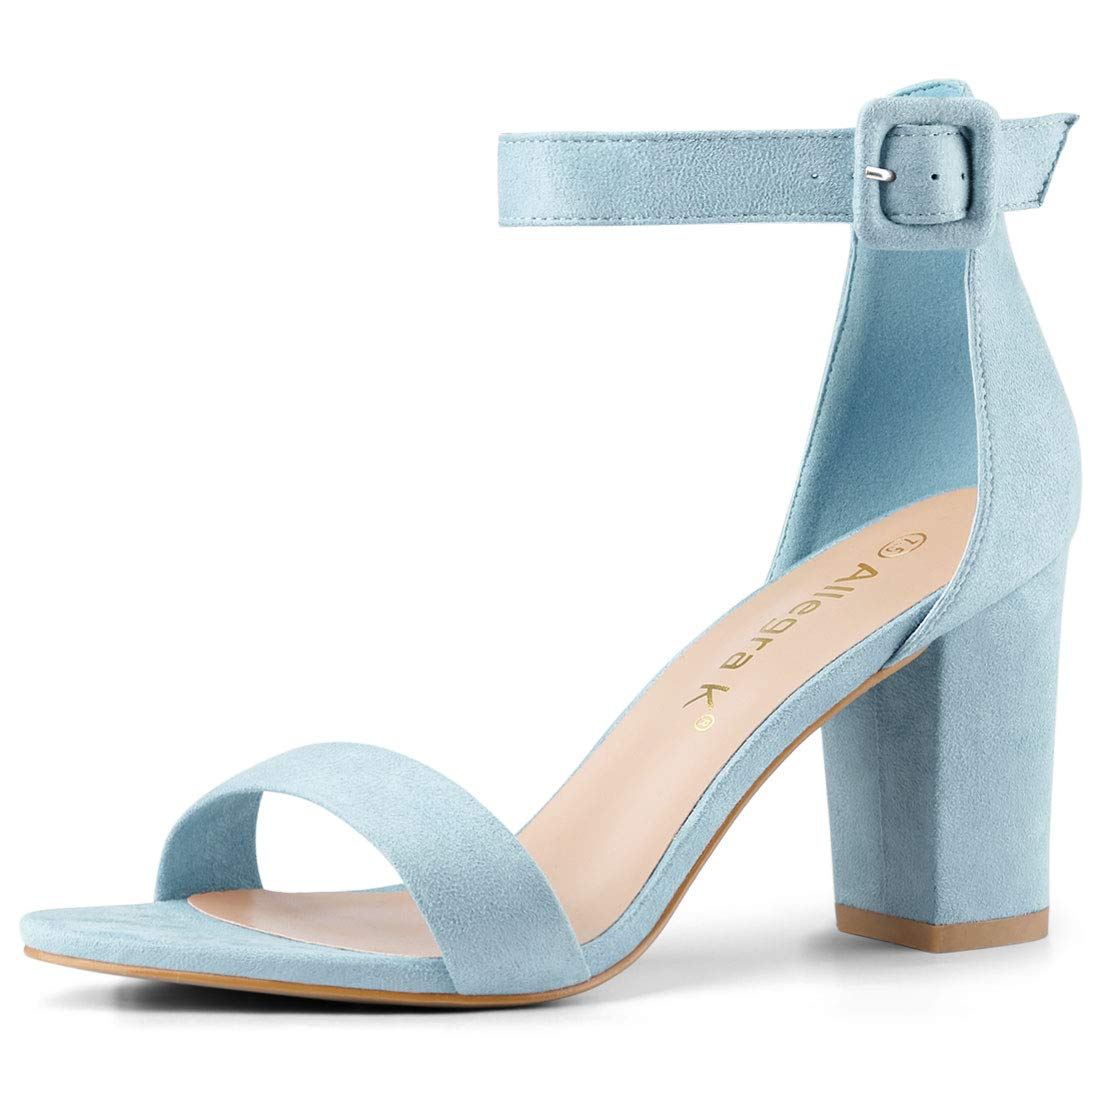 1bf29f36e Allegra K Women s High Chunky Heel Buckle Ankle Strap Sandals